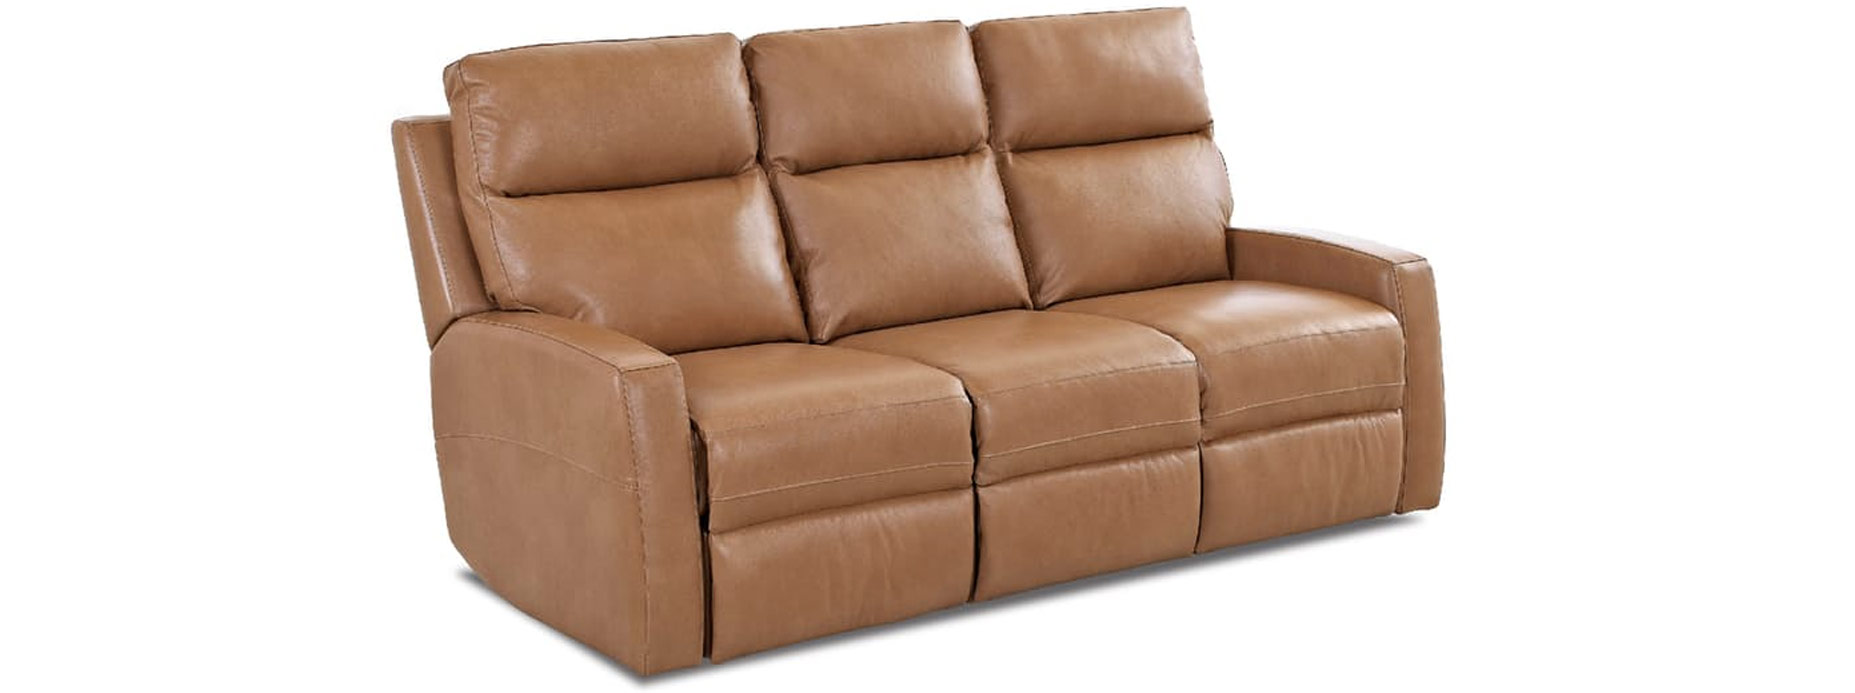 Comfort Design Furniture At Hickory Park Furniture Galleries